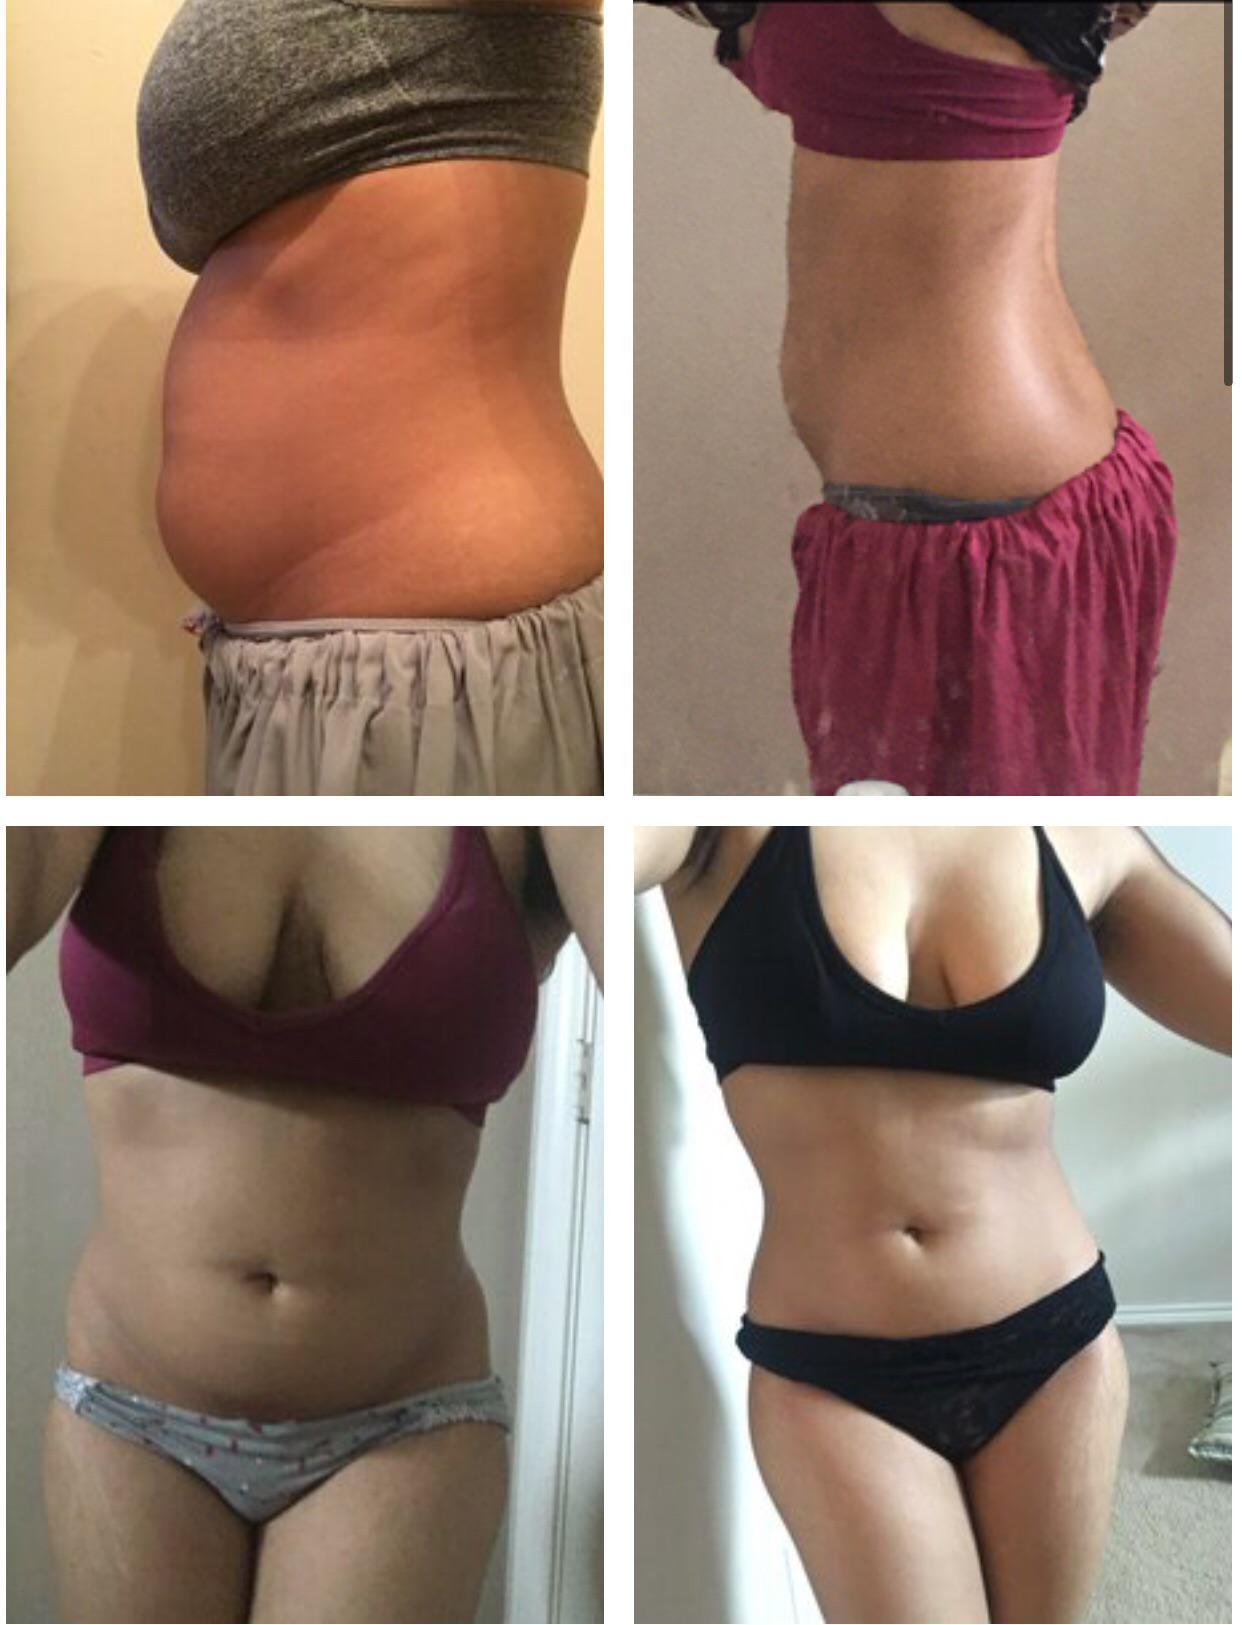 5 foot Female Progress Pics of 13 lbs Weight Loss 126 lbs to 113 lbs